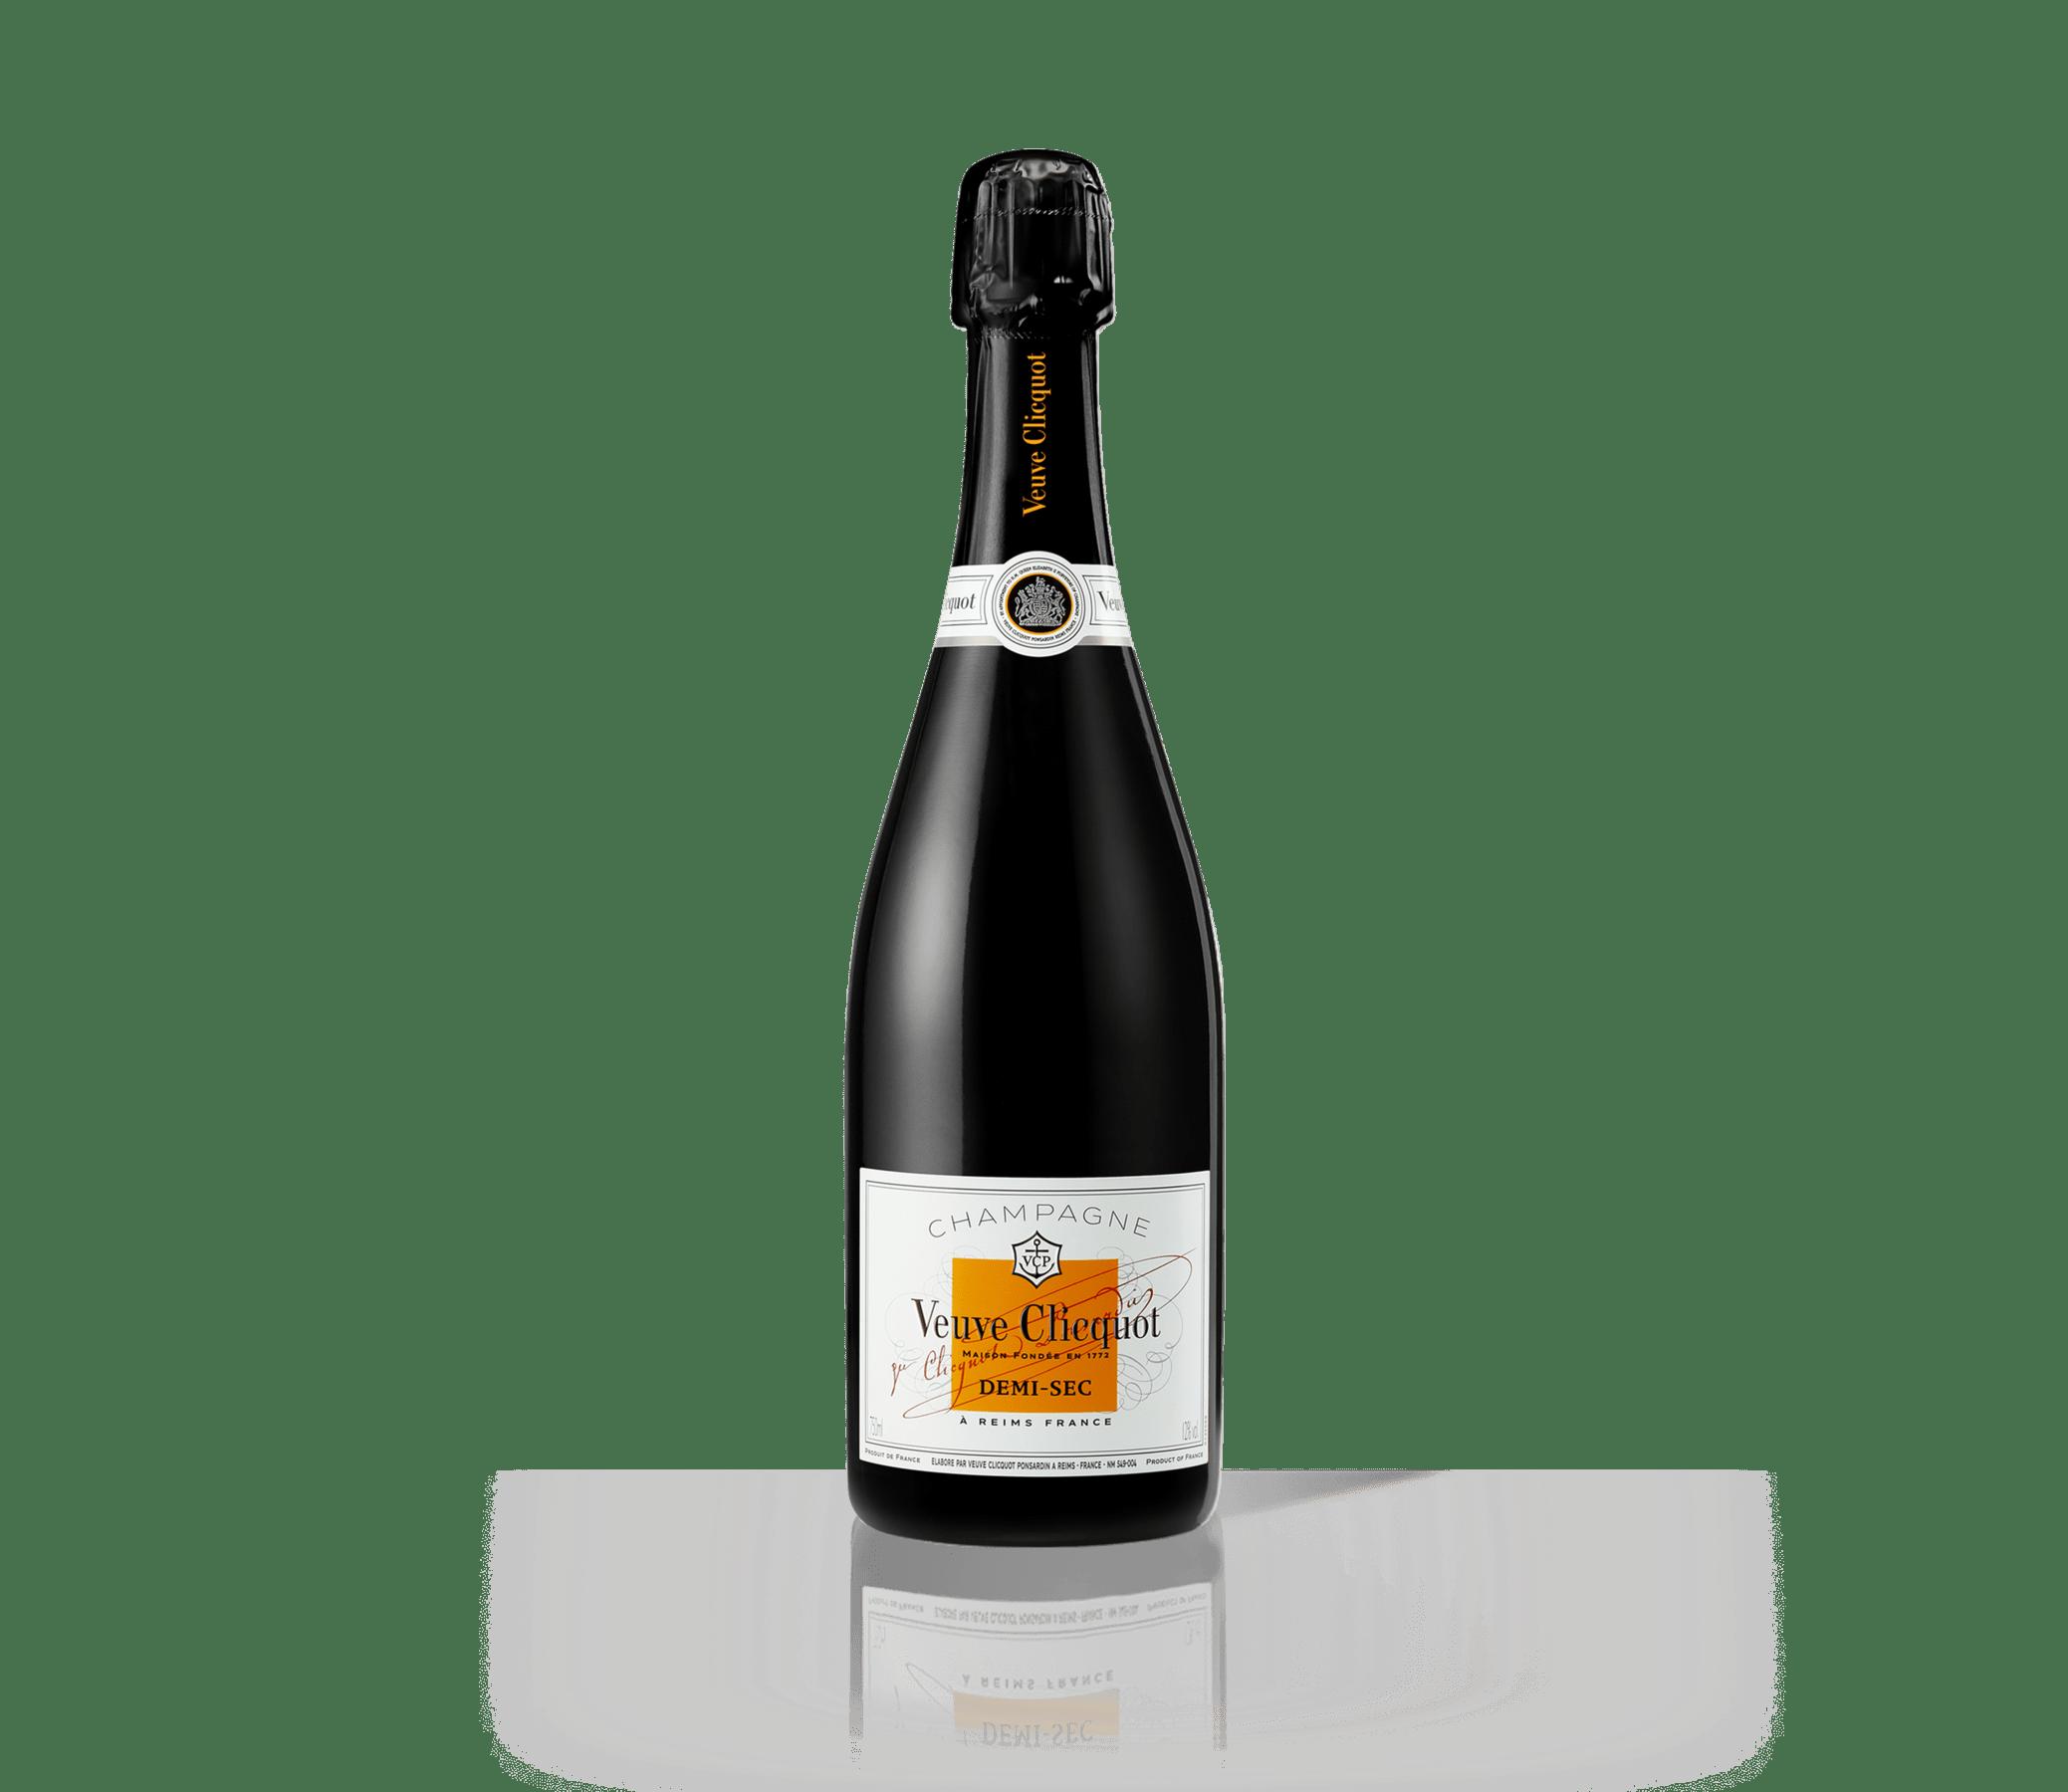 Bottiglia Veuve Clicquot Champagne Demi-Sec